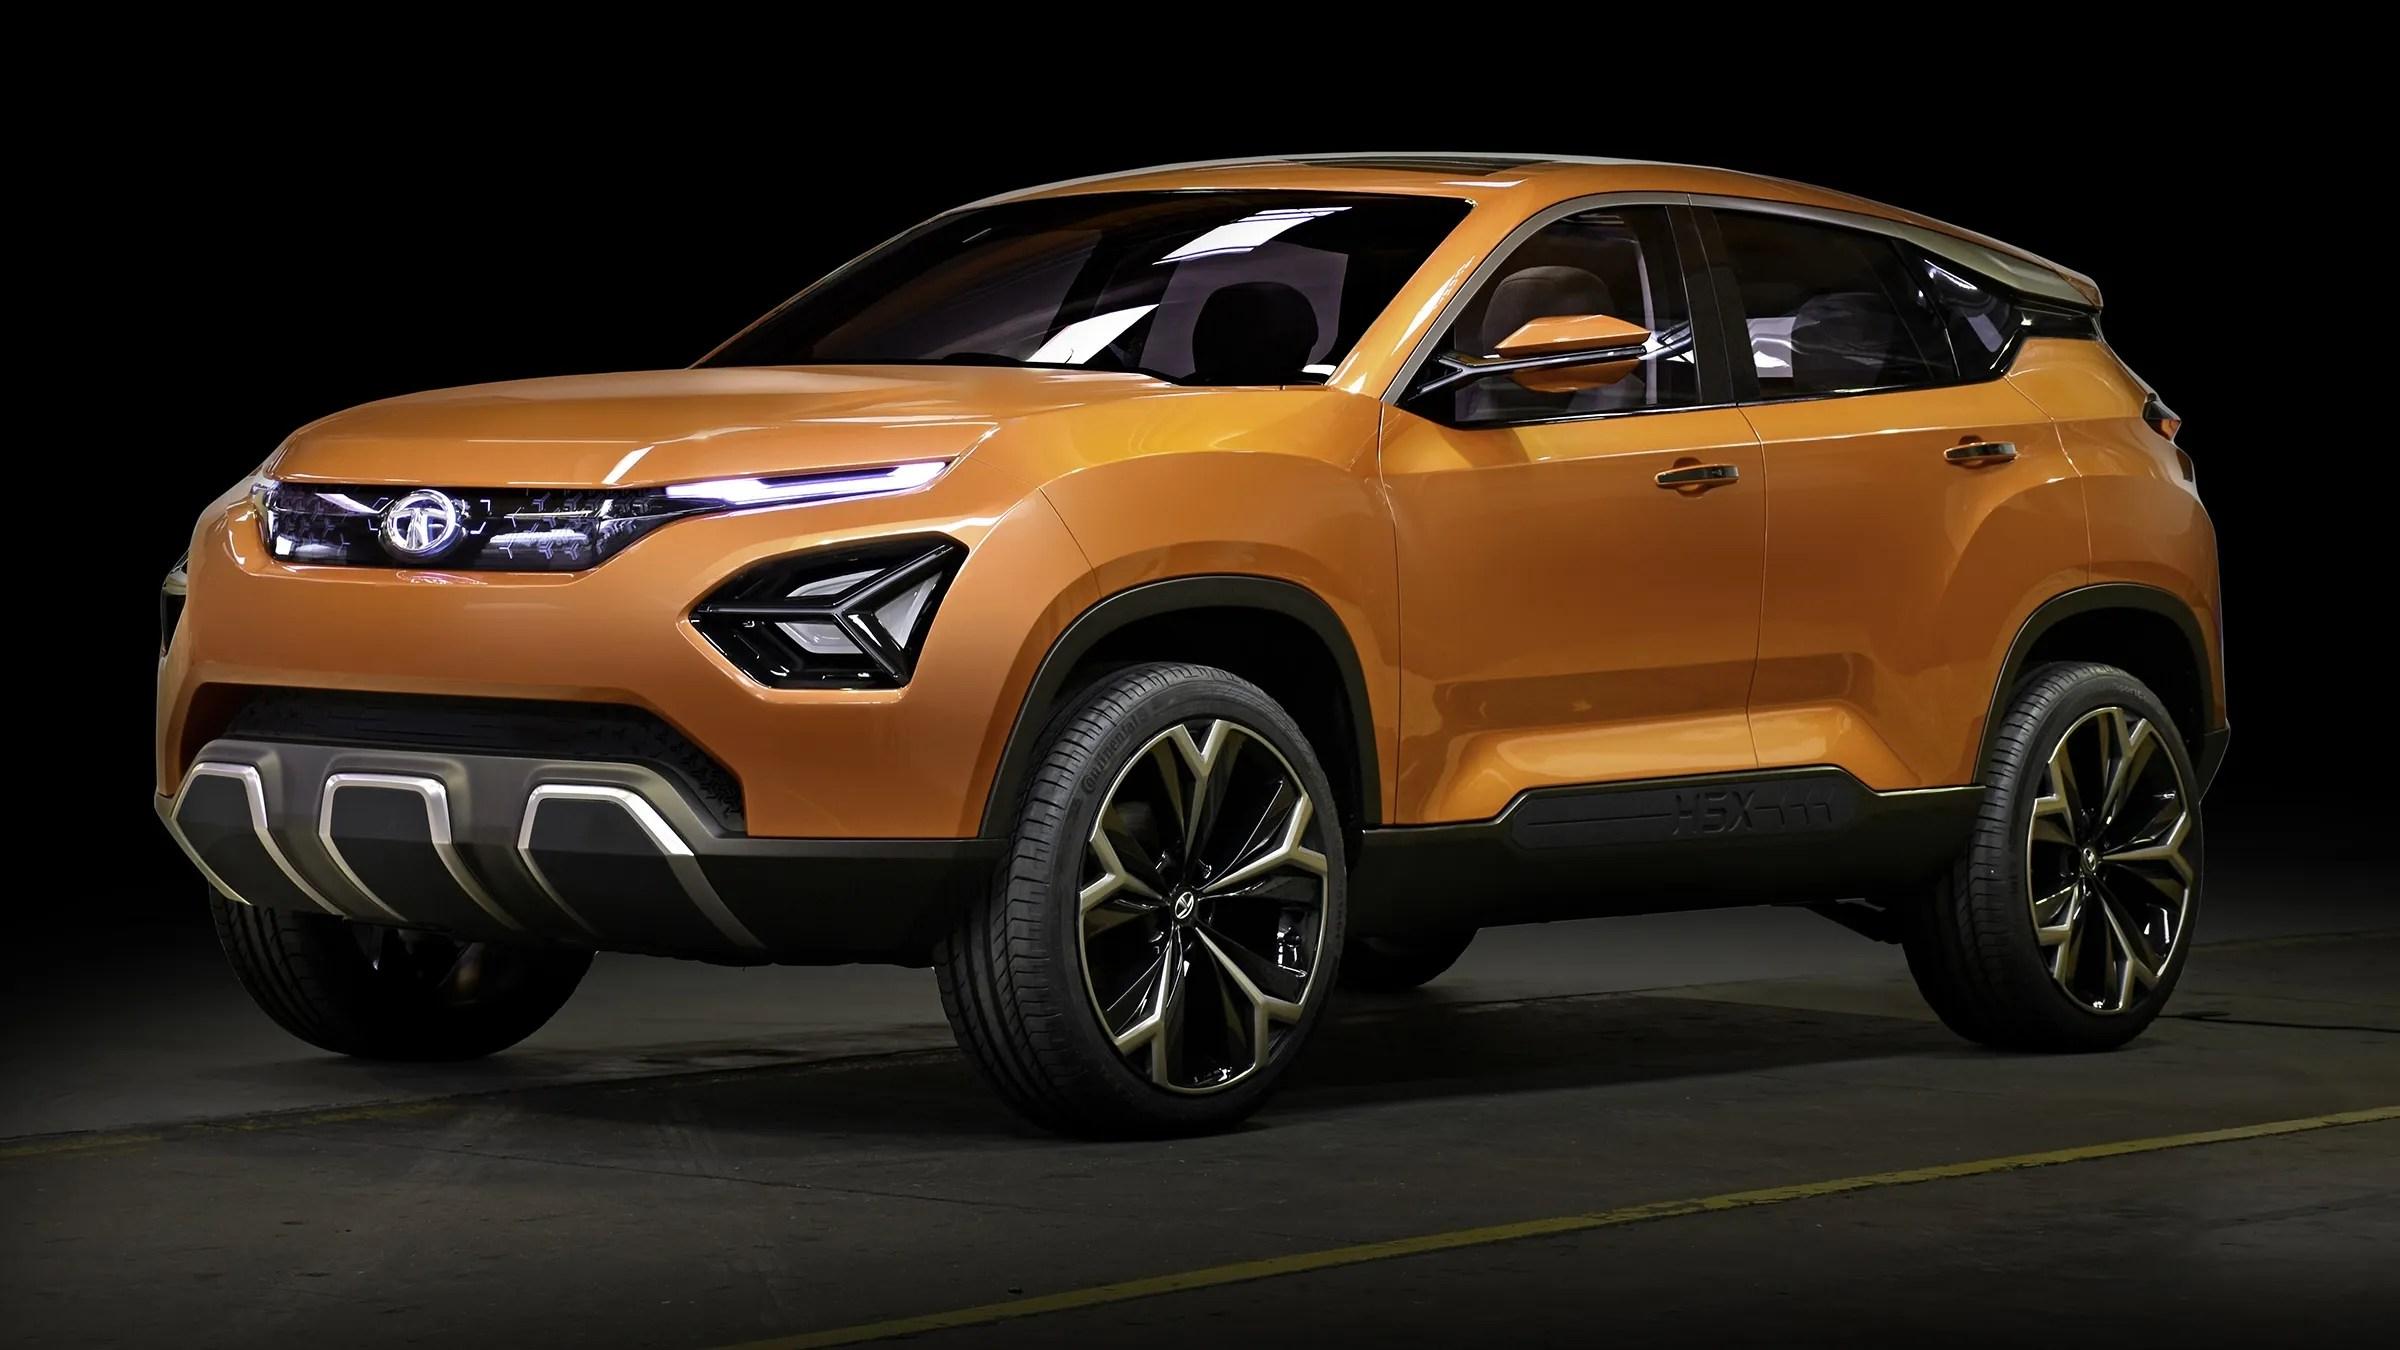 Tata H5x Concept Previews Land Rover Based Suv In Geneva